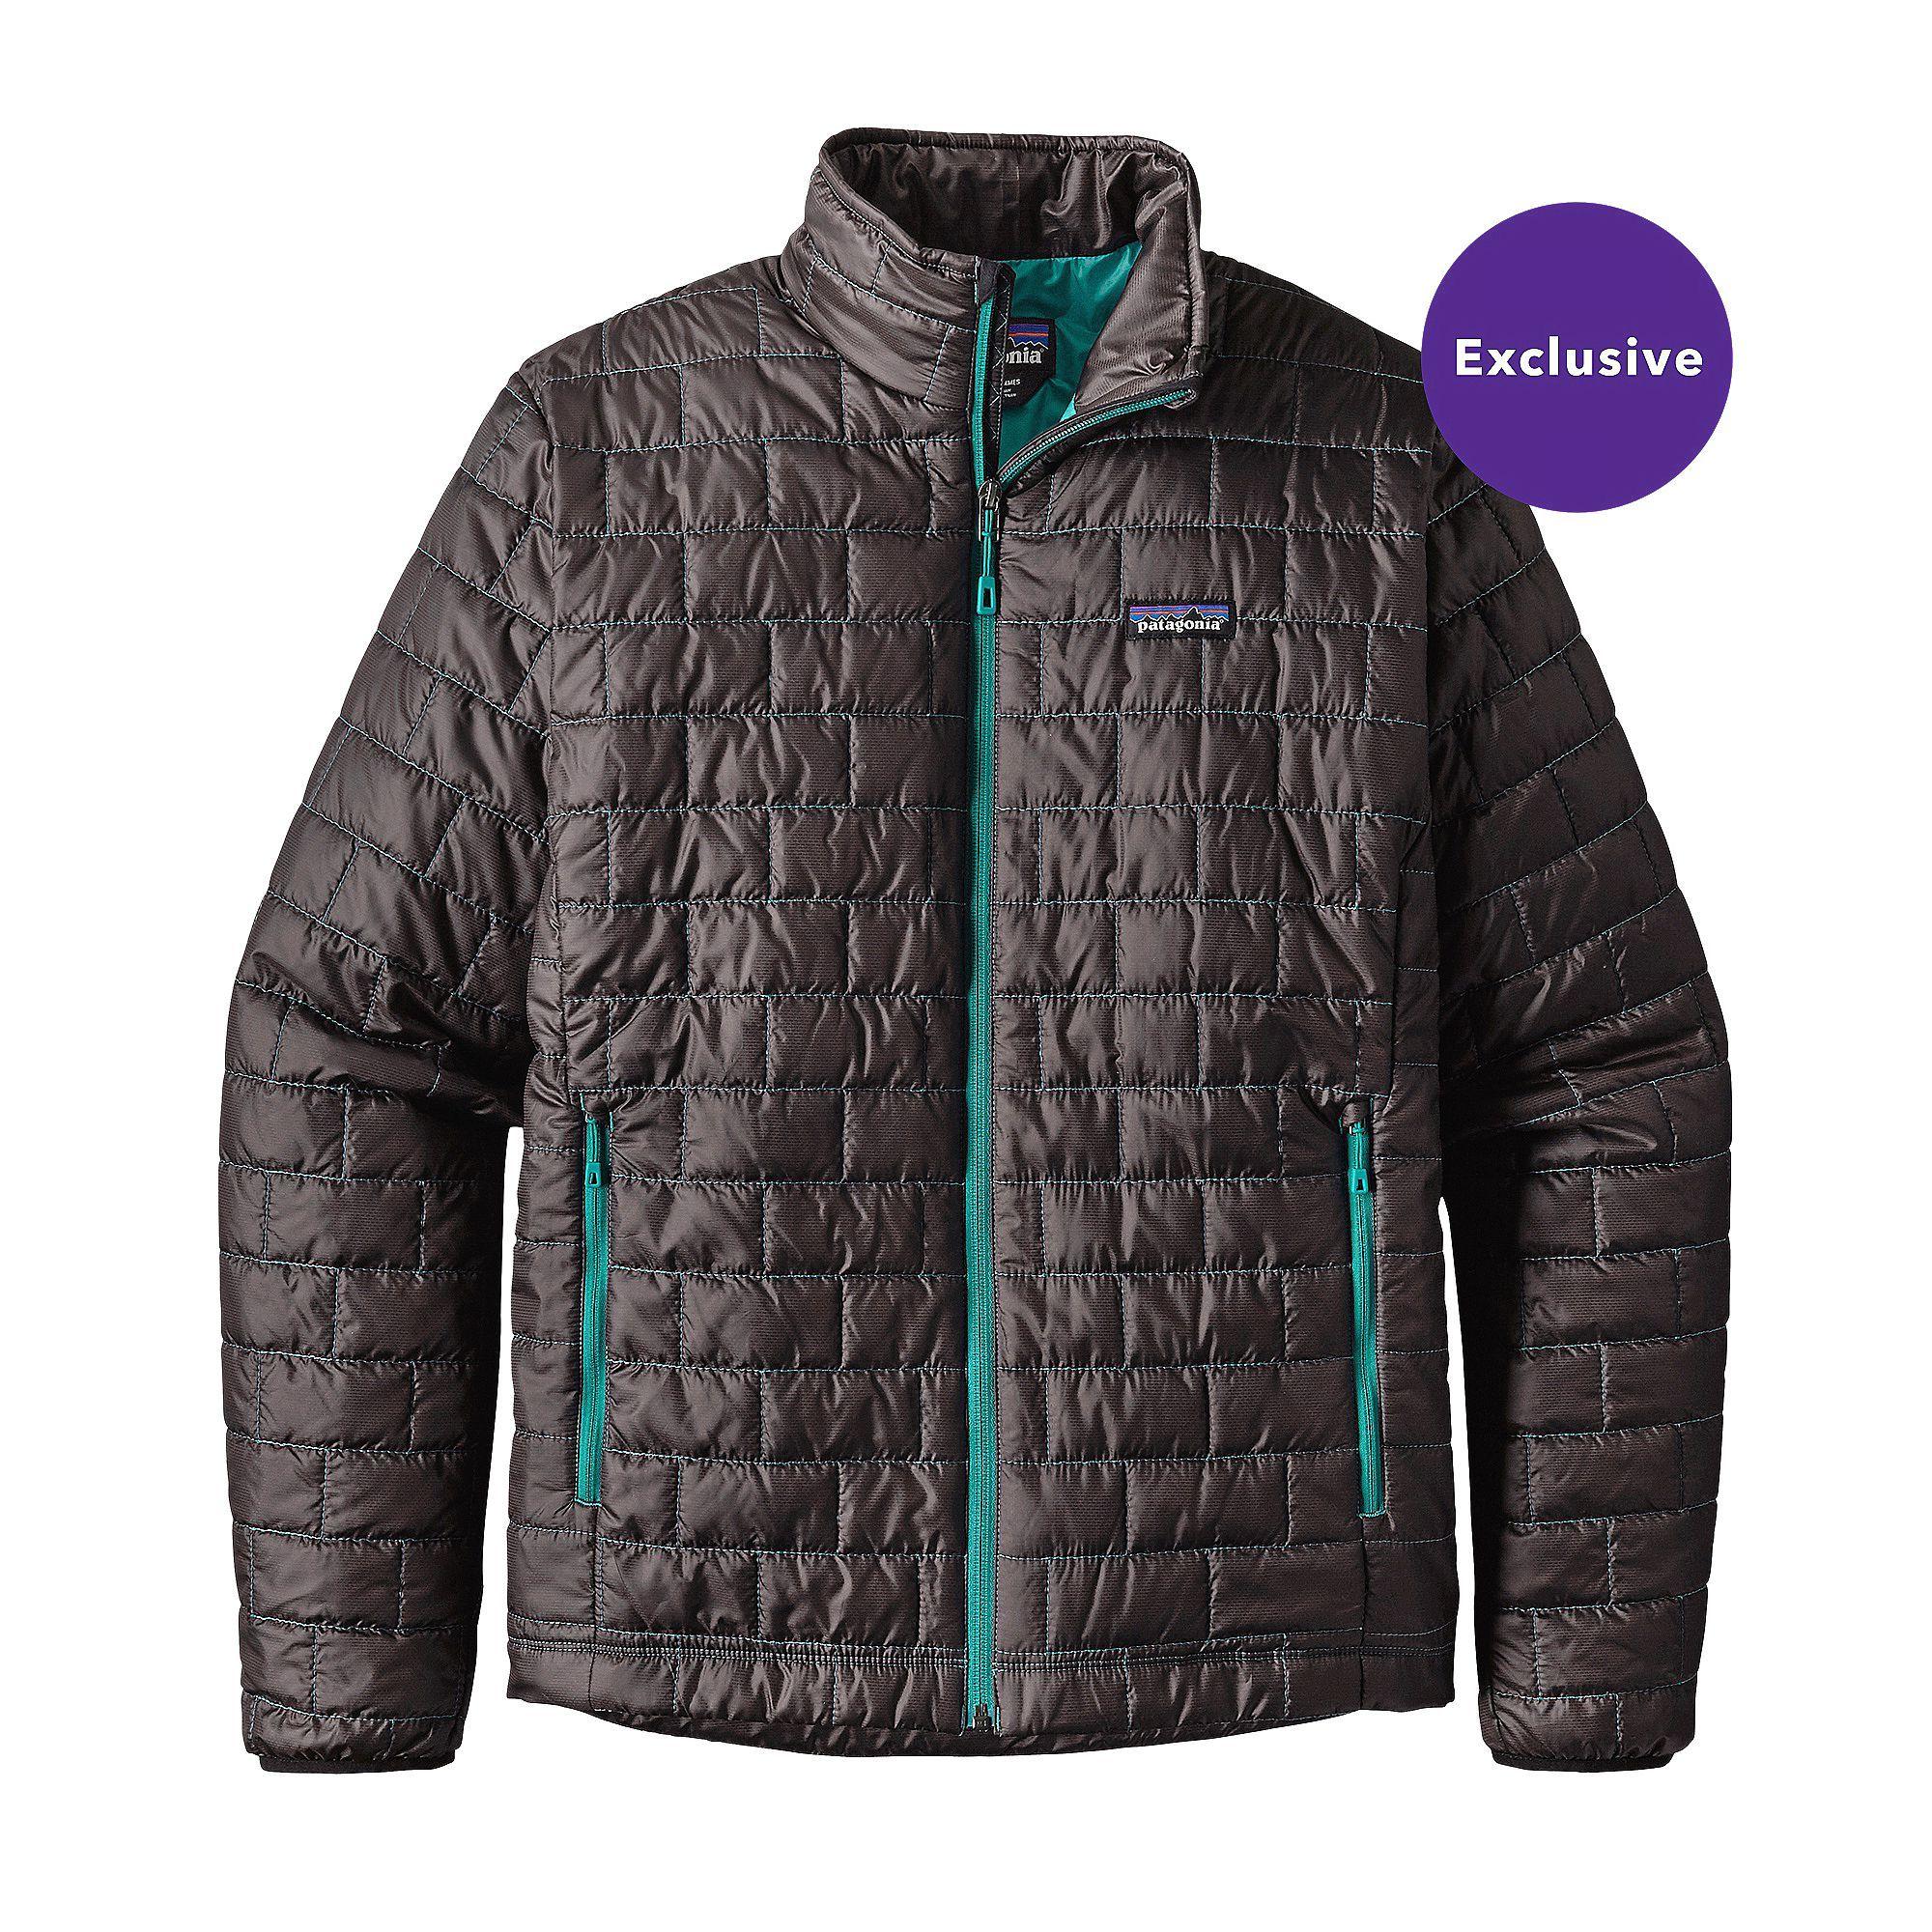 Men's Nano Puff® Jacket Jackets, Outdoor outfit, Men